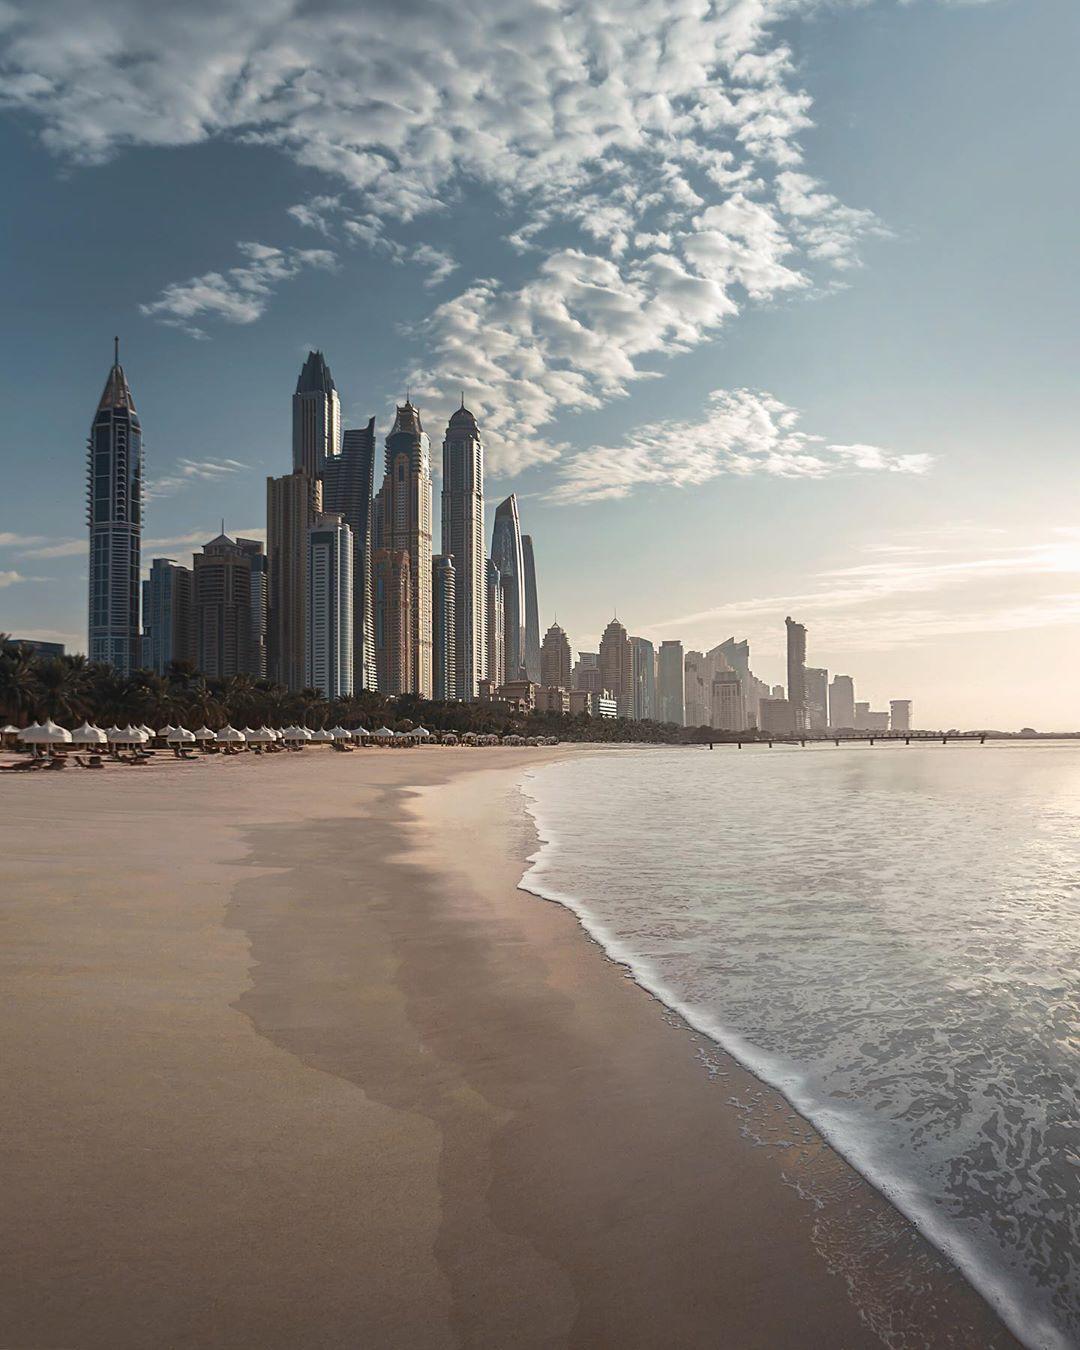 Top 15 Airbnb Accommodations In Dubai, UAE via: visualsofjulius #travel #travelguide #travel2020 #traveltheworld #worldtravel #travelgoals #travelbucketlist #bucketlist #travelitinerary #thingstodo #bestplaces #travellist #luxurytravel #travelitinerary #trip #vacation #2020vacation #quarantinedeals #airbnb #hotels #hostels #cabins #villas